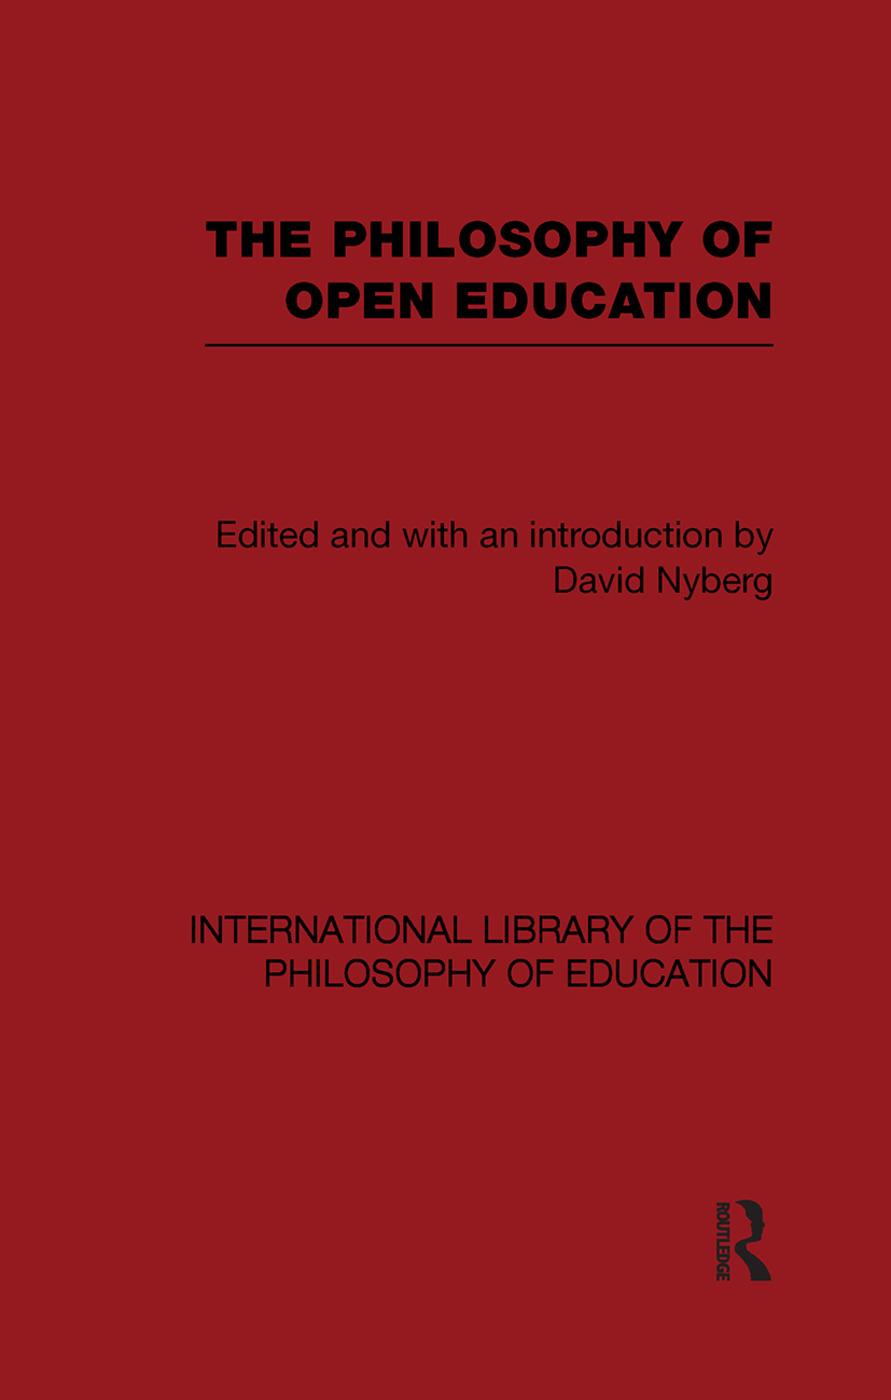 The Philosophy of Open Education (International Library of the Philosophy of Education Volume 15)